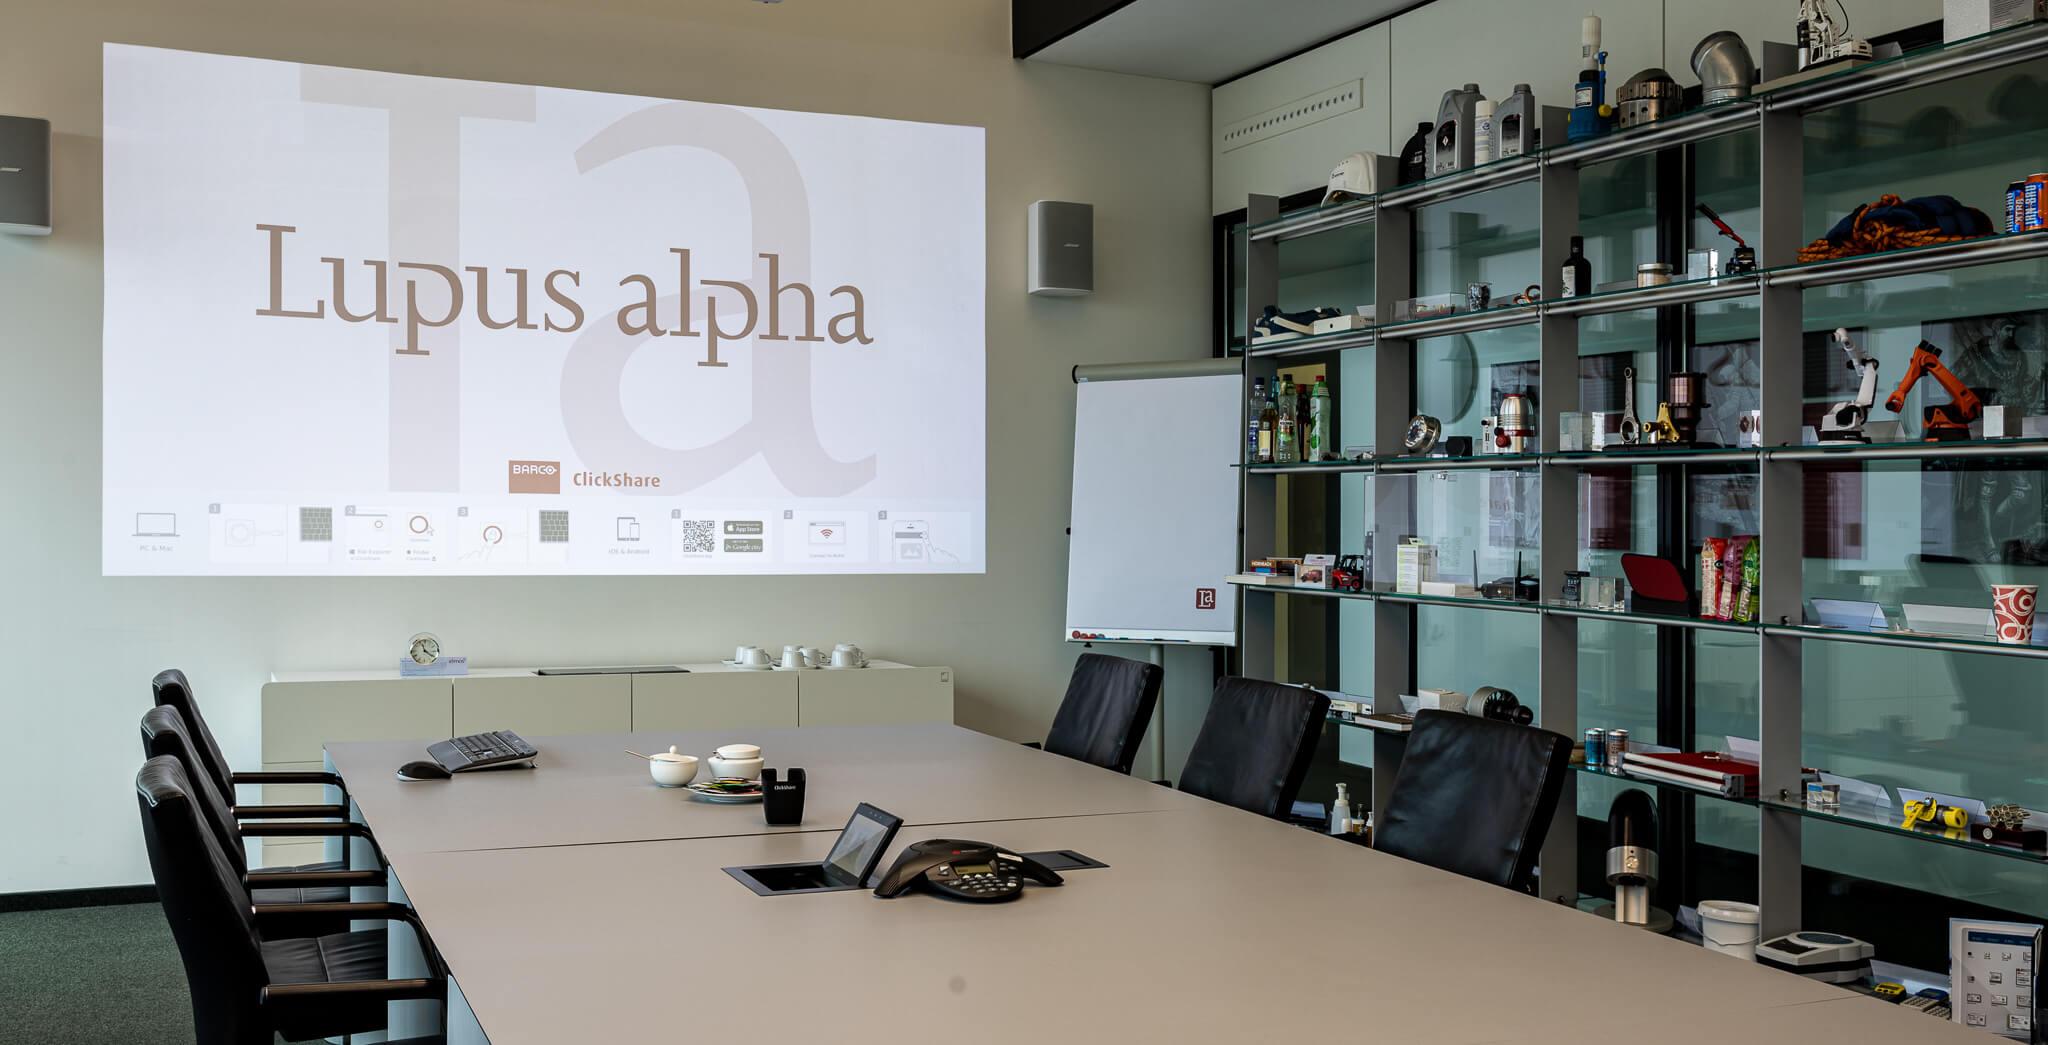 Lupus_alpha_home